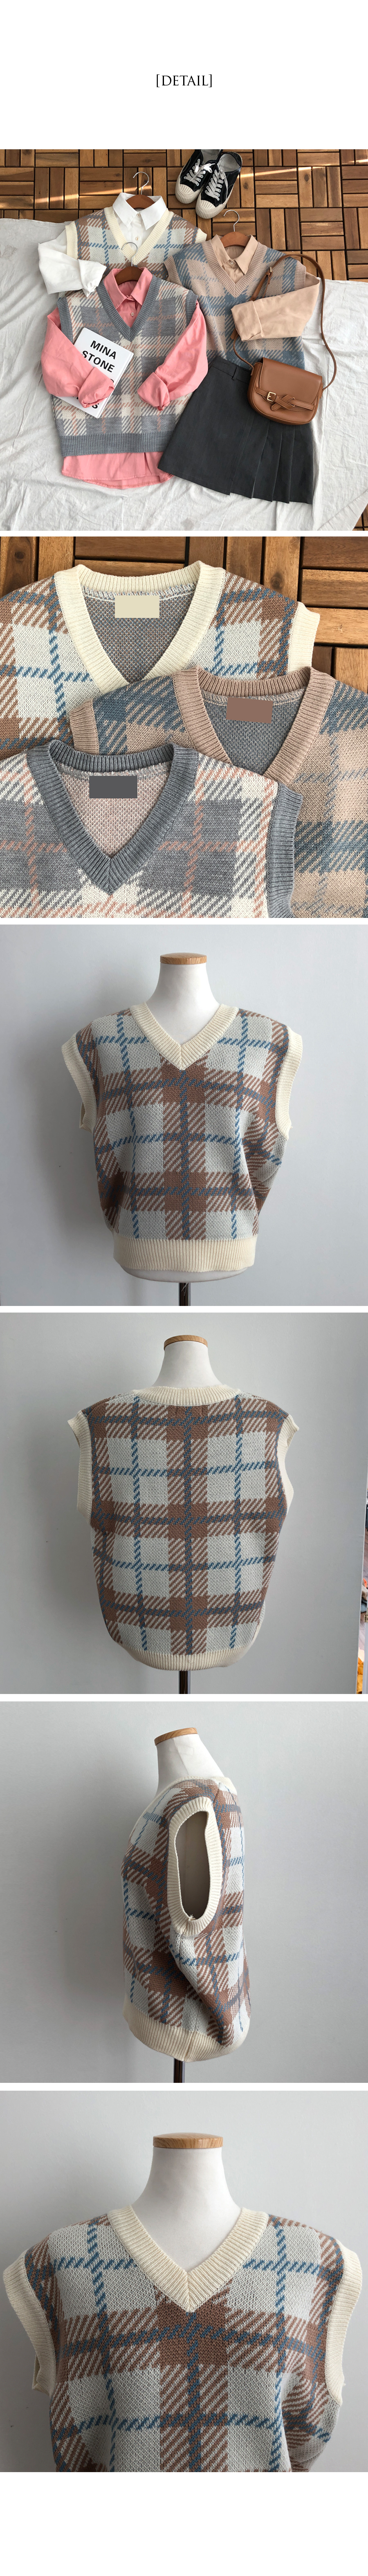 Foaming check vest